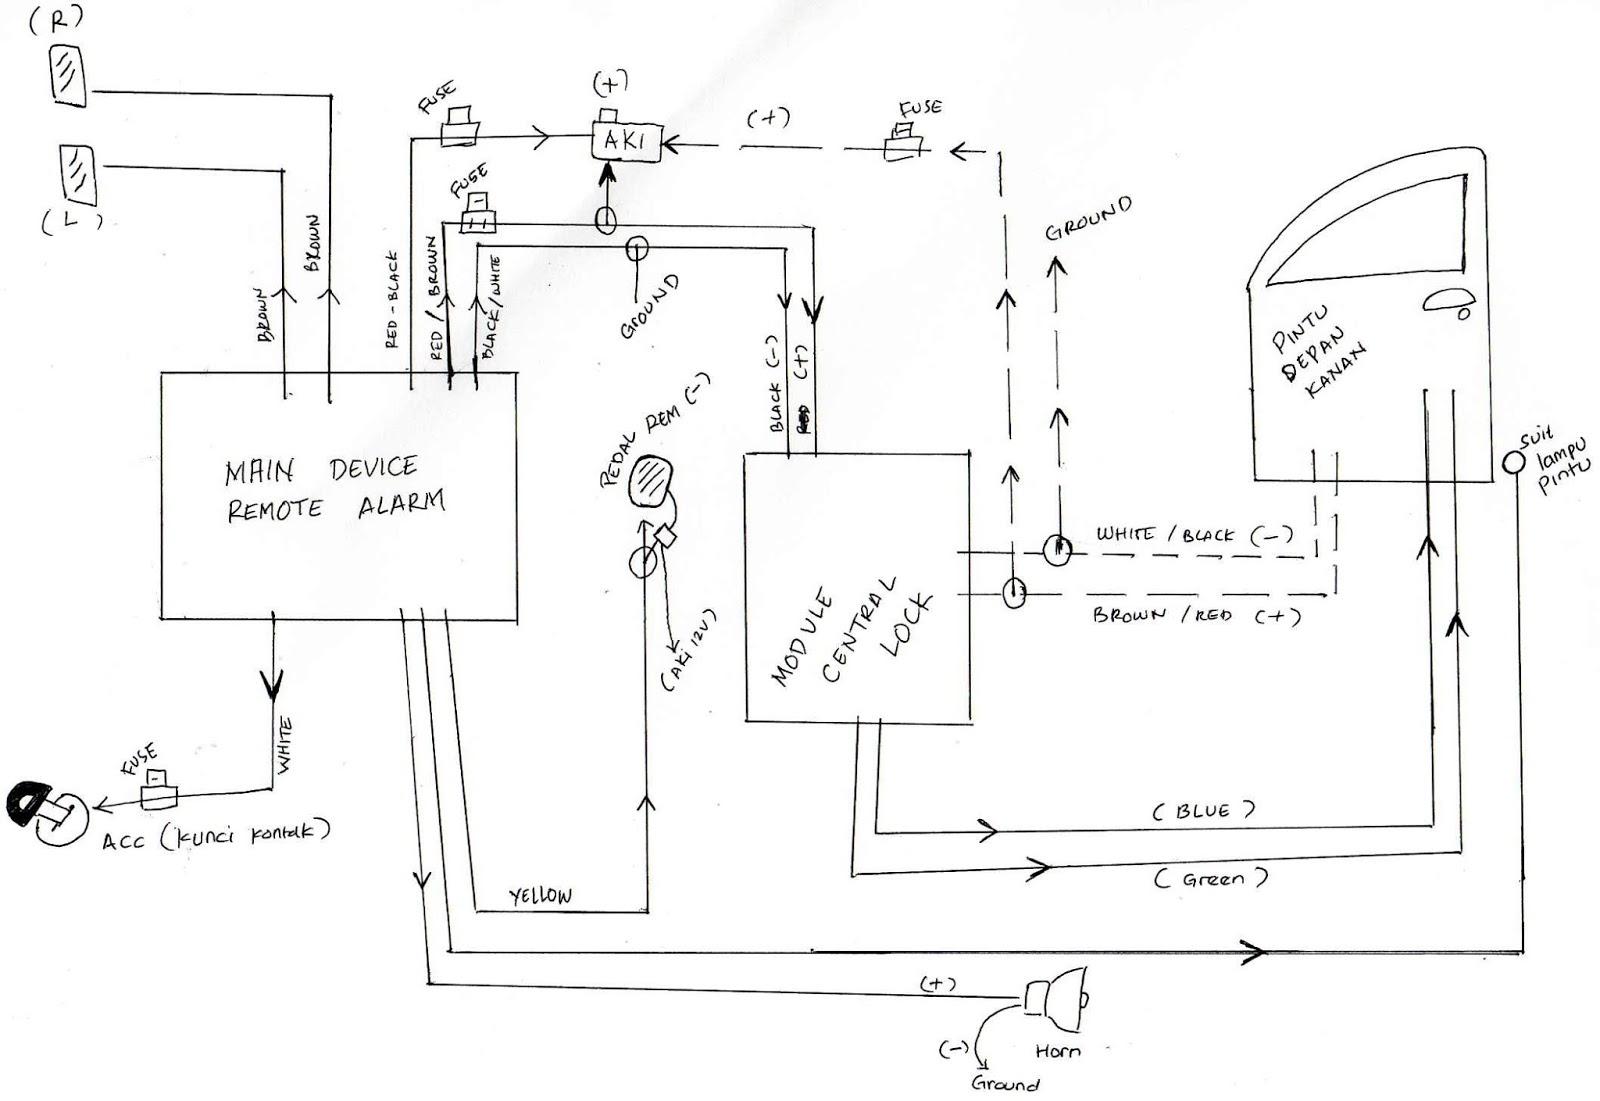 Wiring diagram ac mobil free download wiring diagram xwiaw ac plug free download wiring diagram wiring diagram central lock avanza jzgreentown of wiring diagram ac mobil swarovskicordoba Gallery